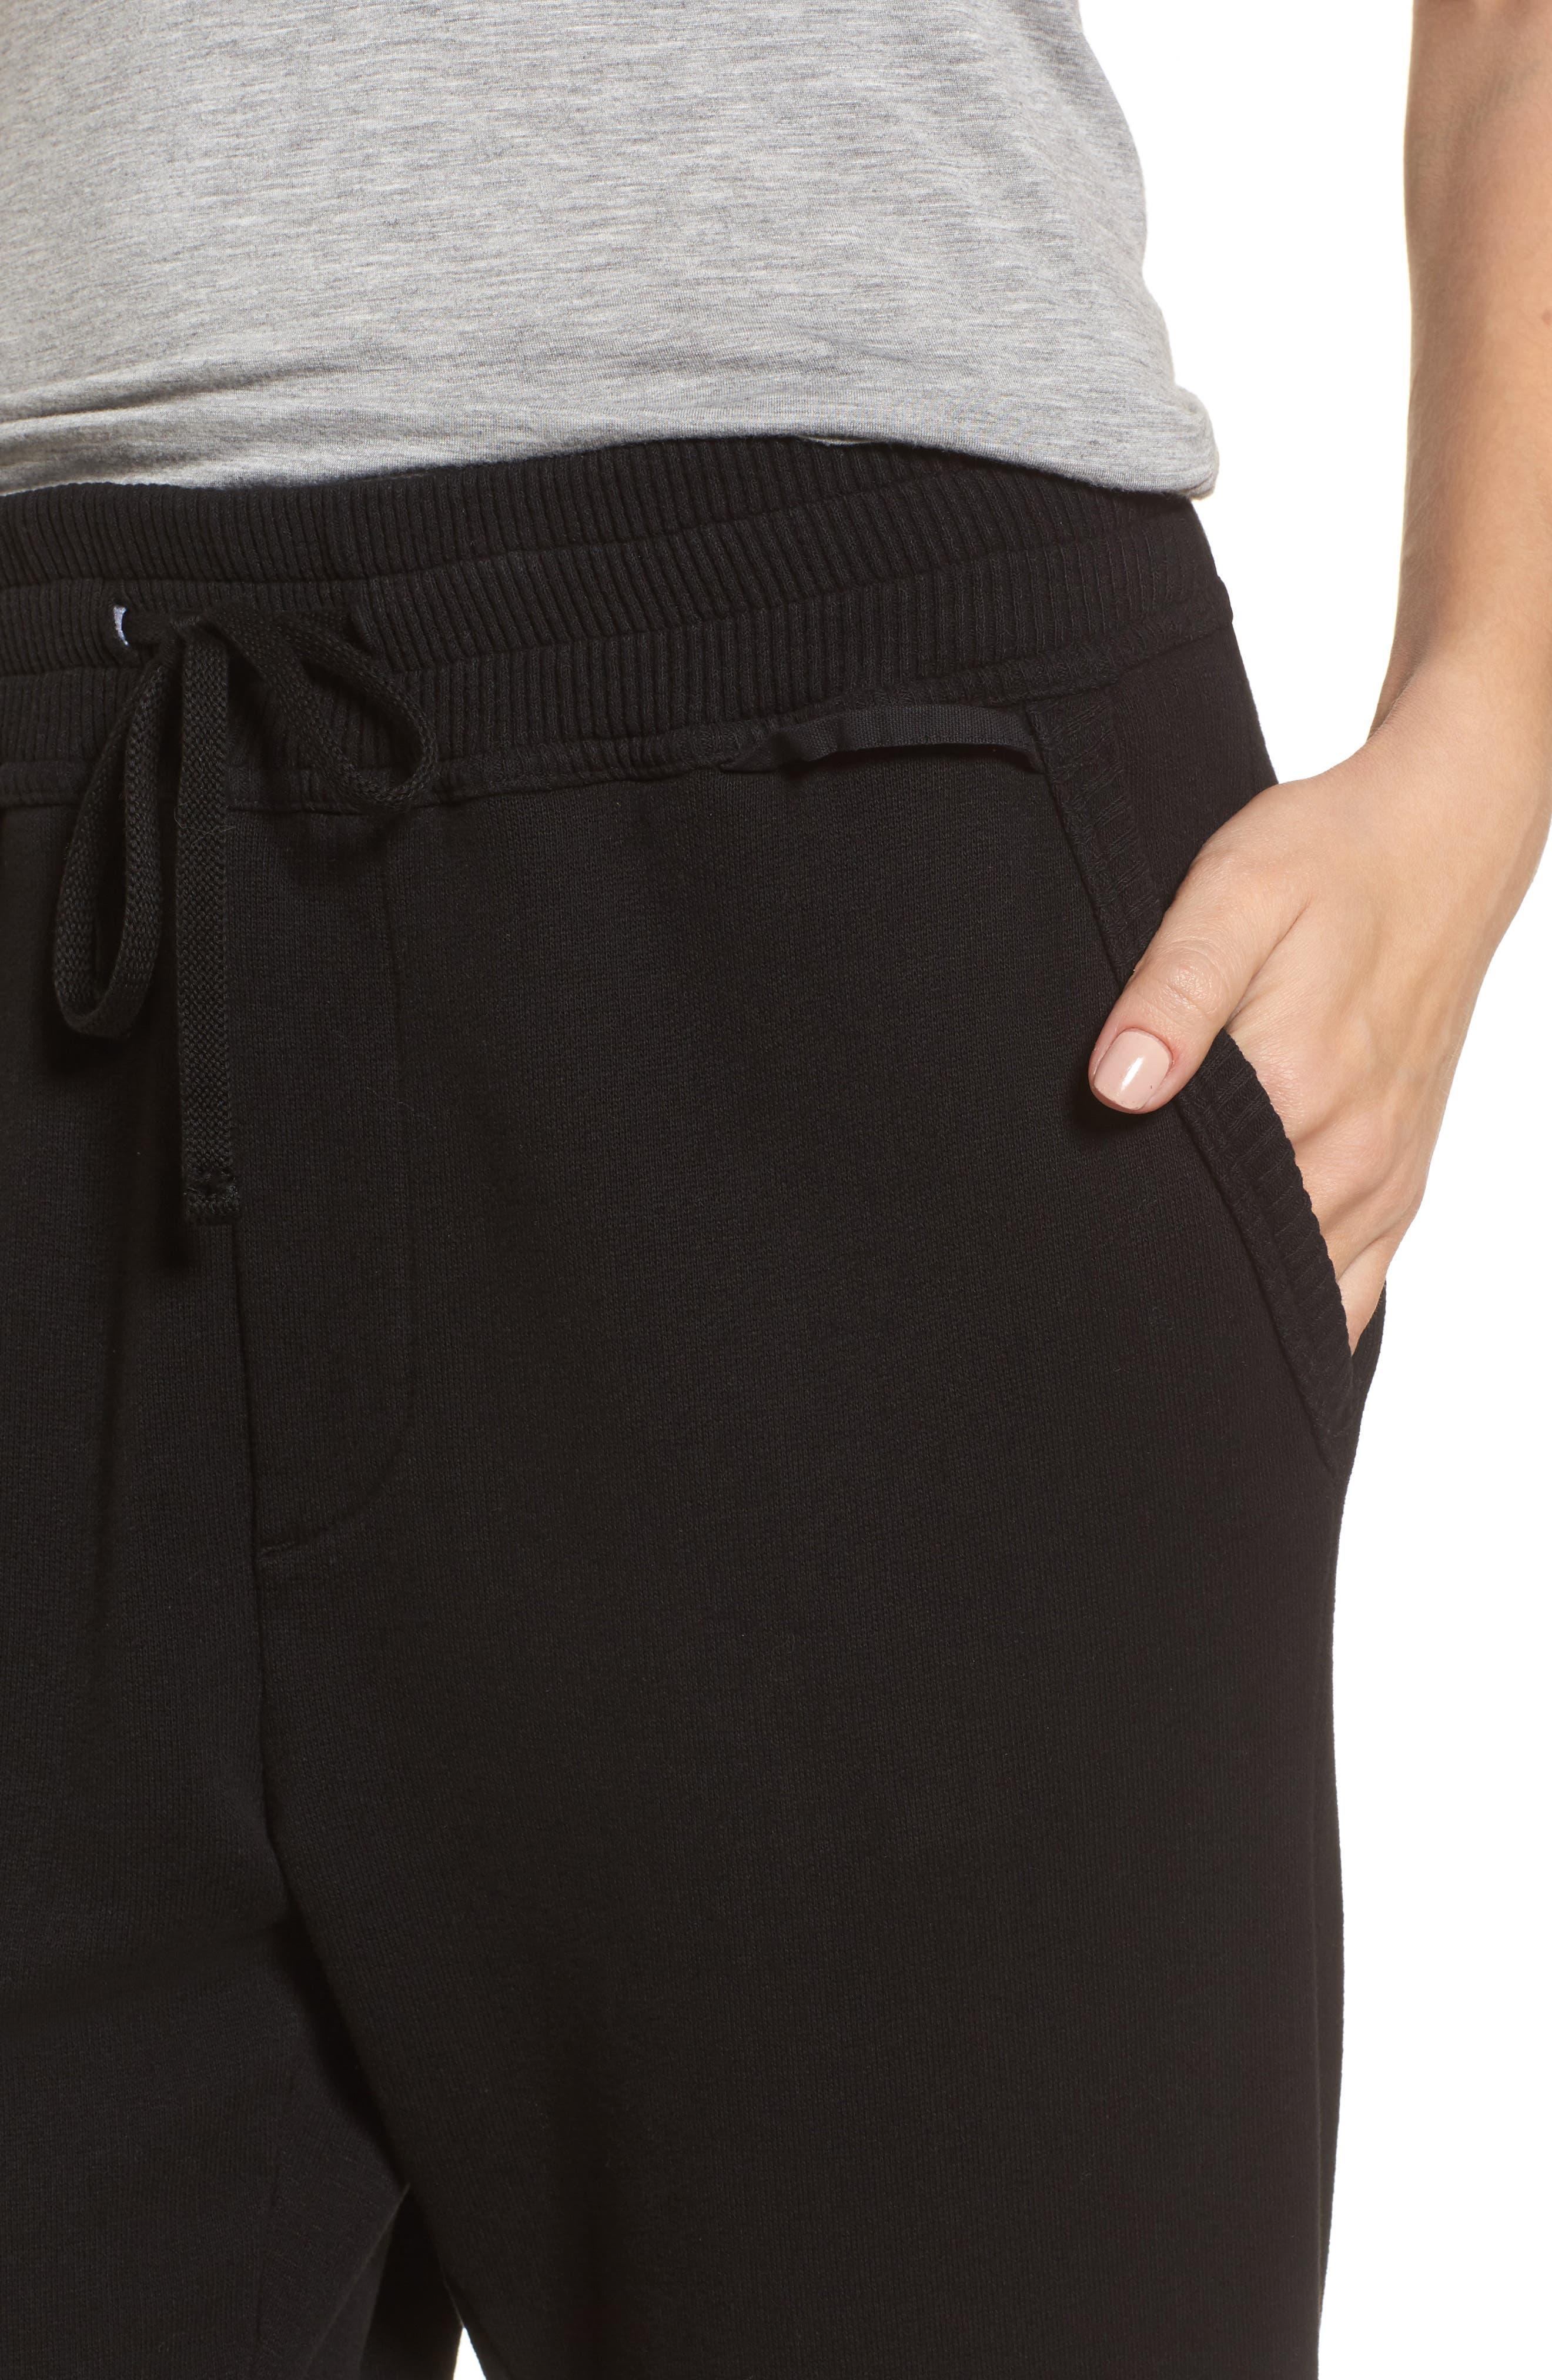 Terry Lounge Pants,                             Alternate thumbnail 4, color,                             001